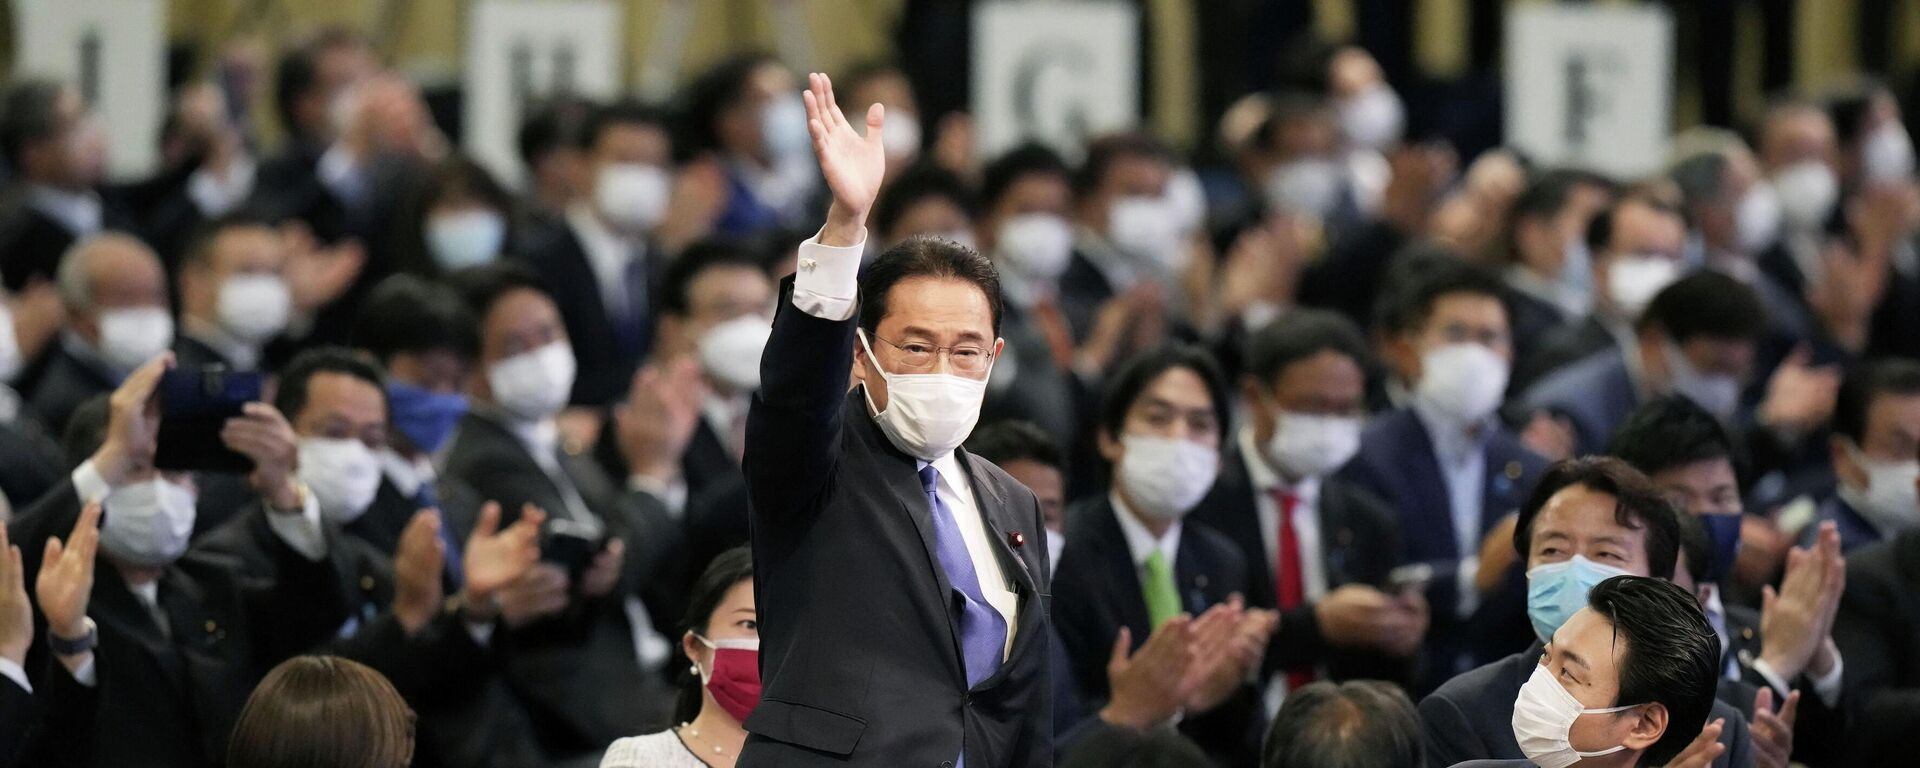 Fumio Kishida, presidente del partido gobernante de Japón - Sputnik Mundo, 1920, 29.09.2021